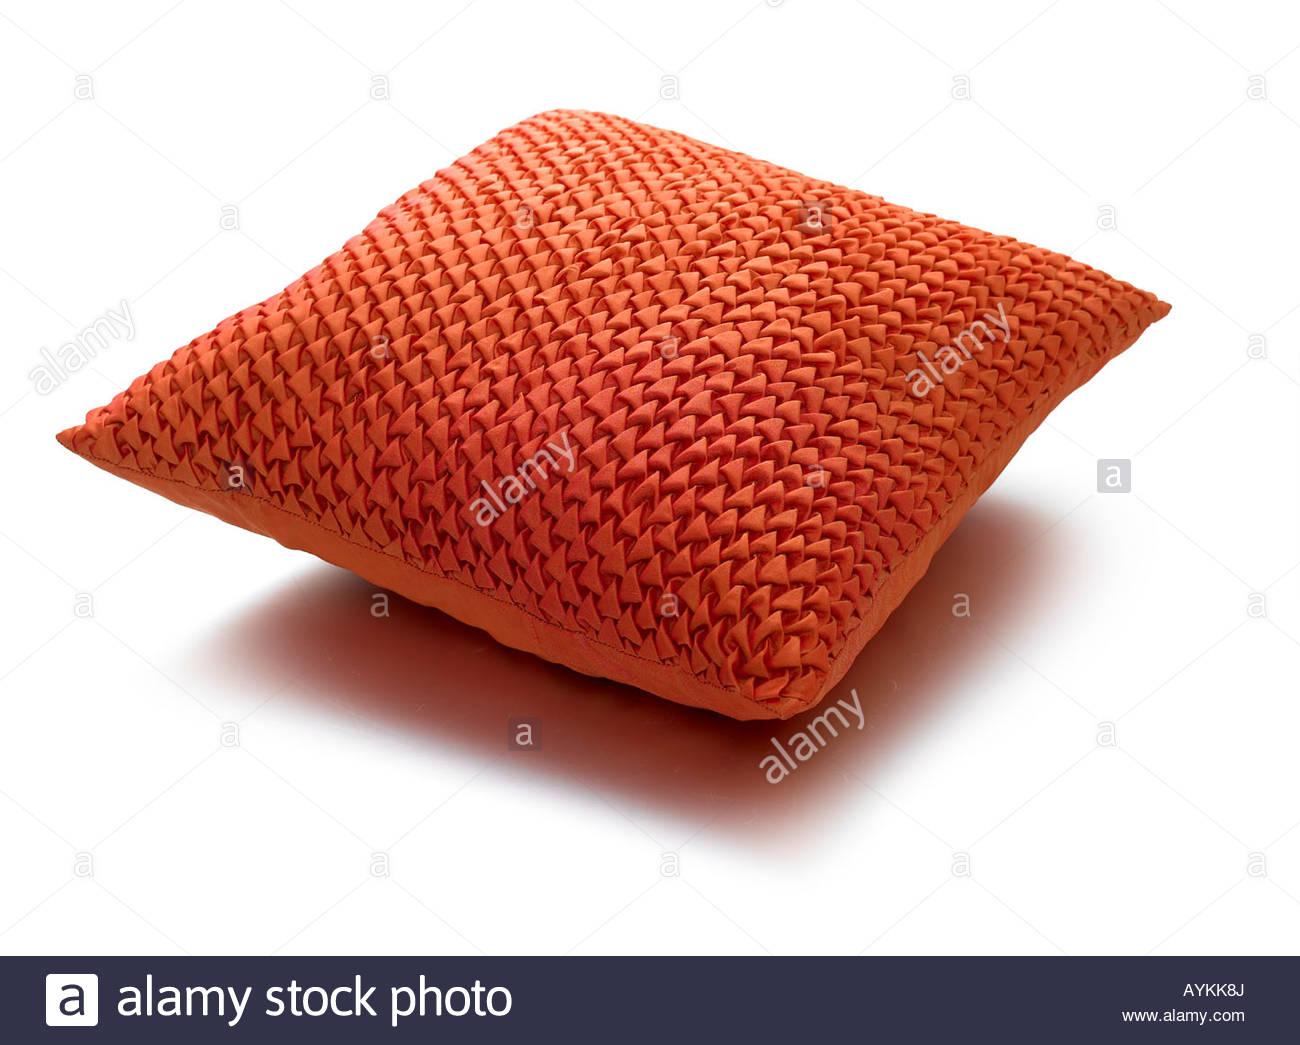 orange kissen stockfoto bild 17132177 alamy. Black Bedroom Furniture Sets. Home Design Ideas